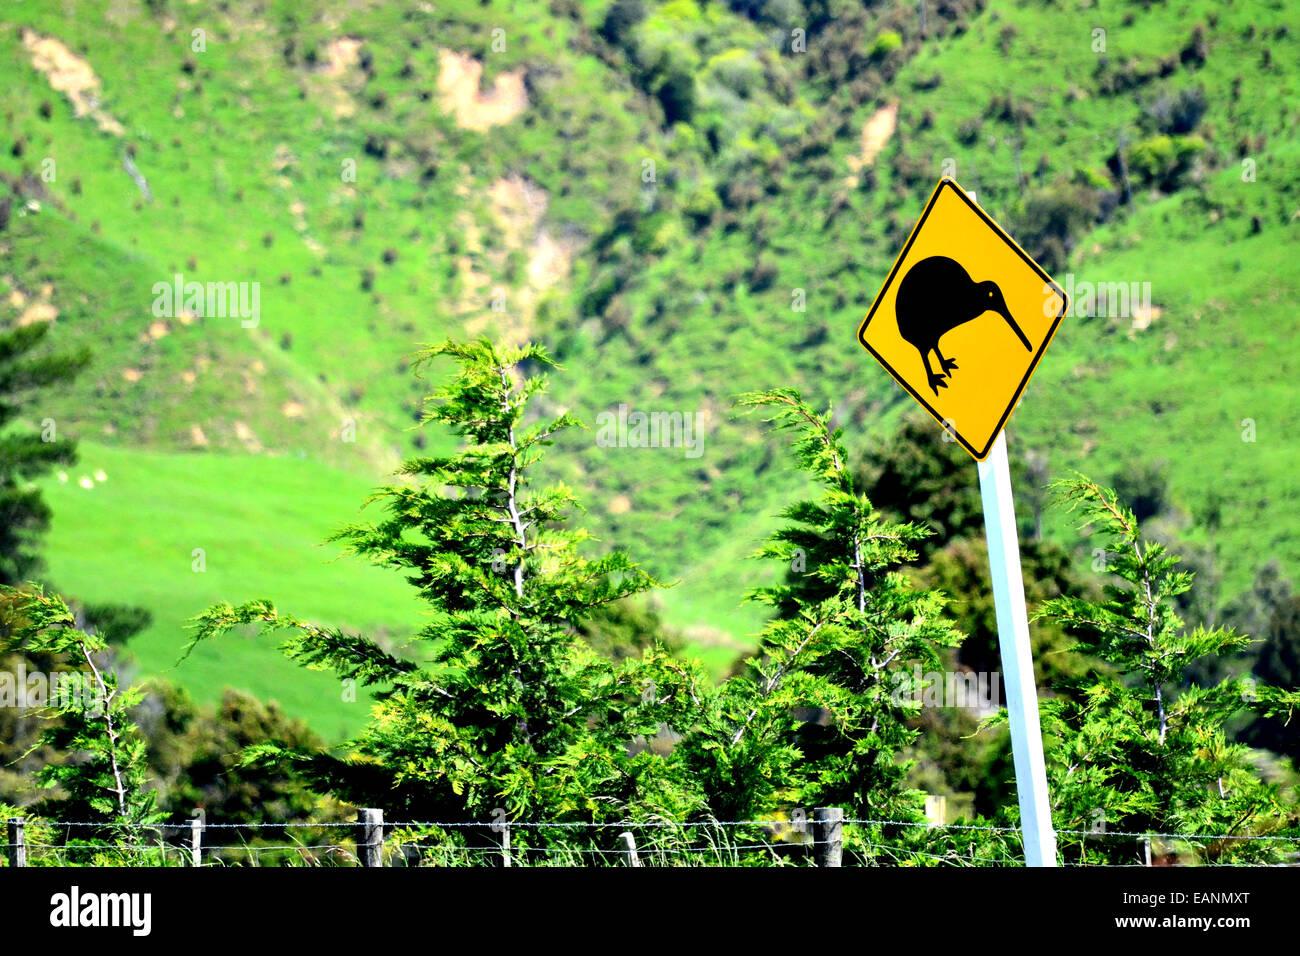 Kiwi bird sign in New Zealand - Stock Image